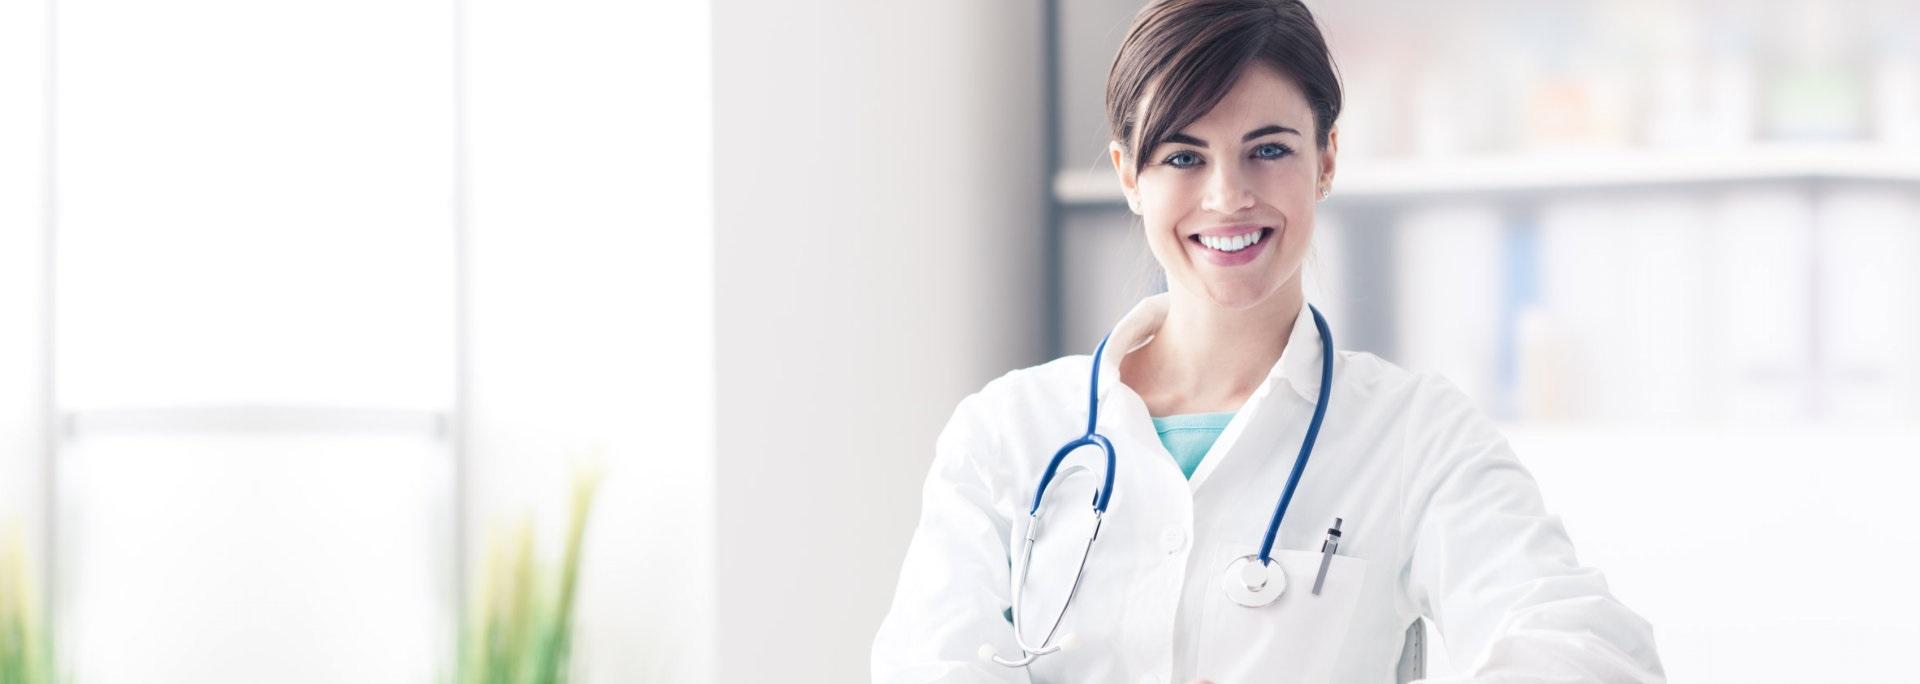 female doctor wearing her stethoscope